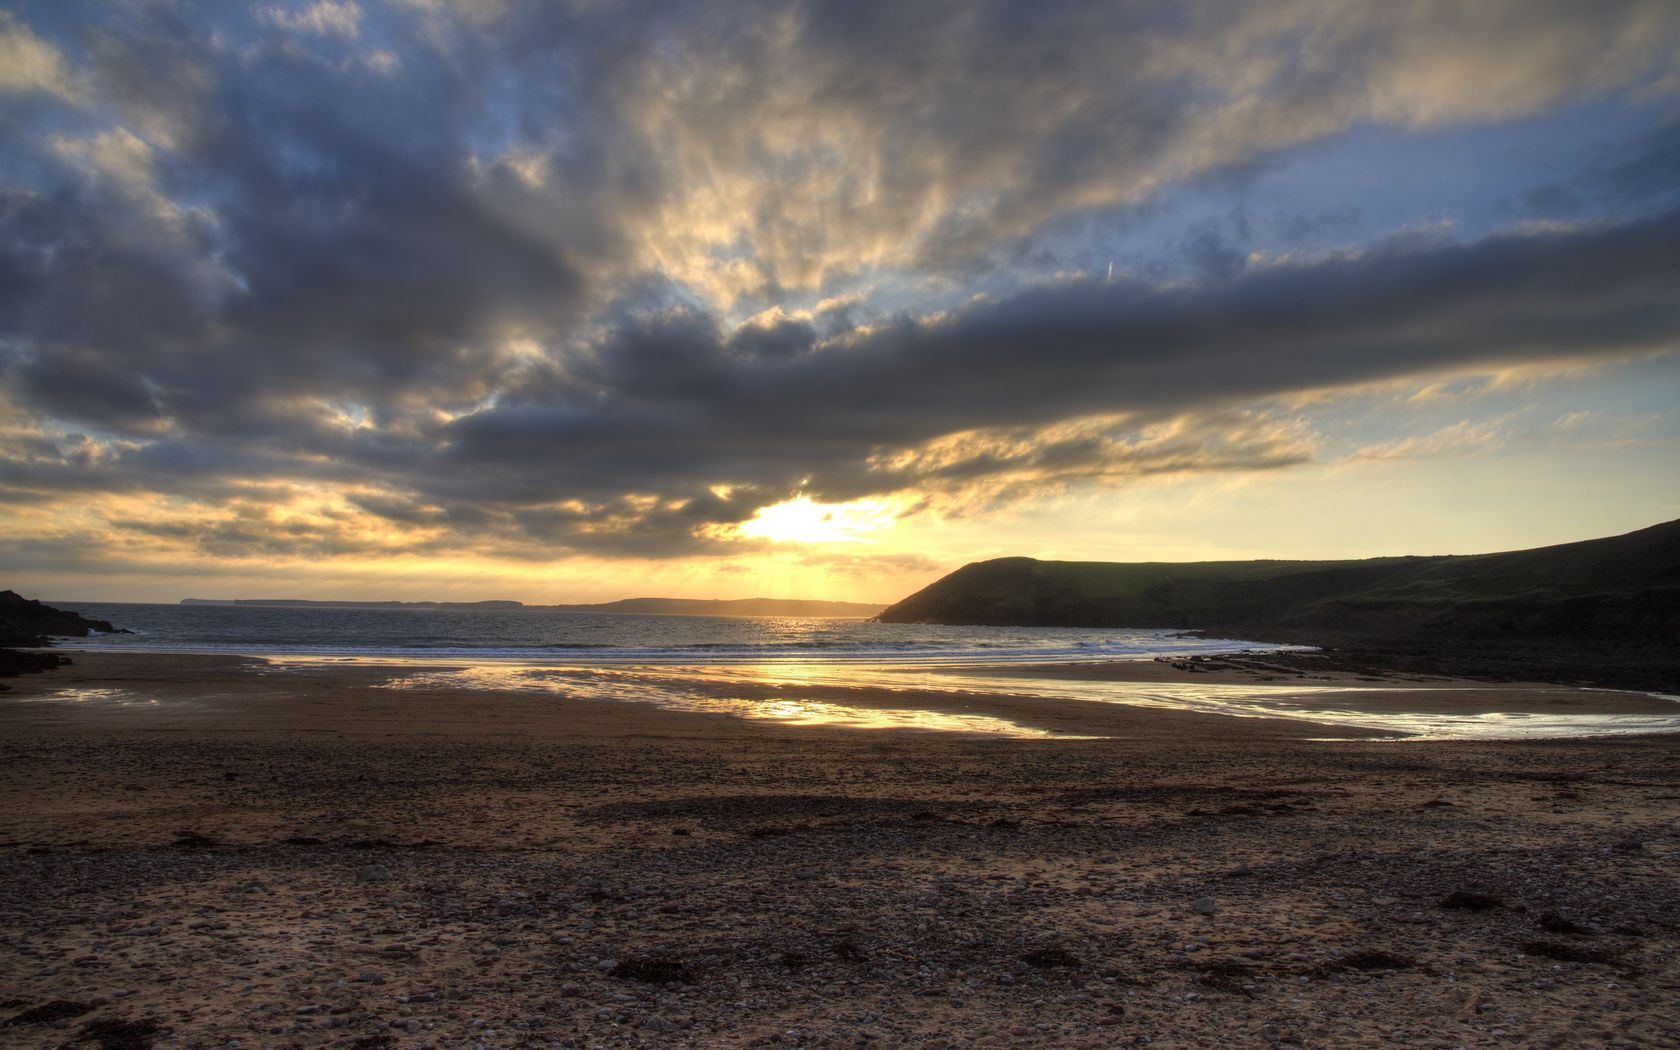 1680x1050 Wallpaper shore, water, sunset, landscape